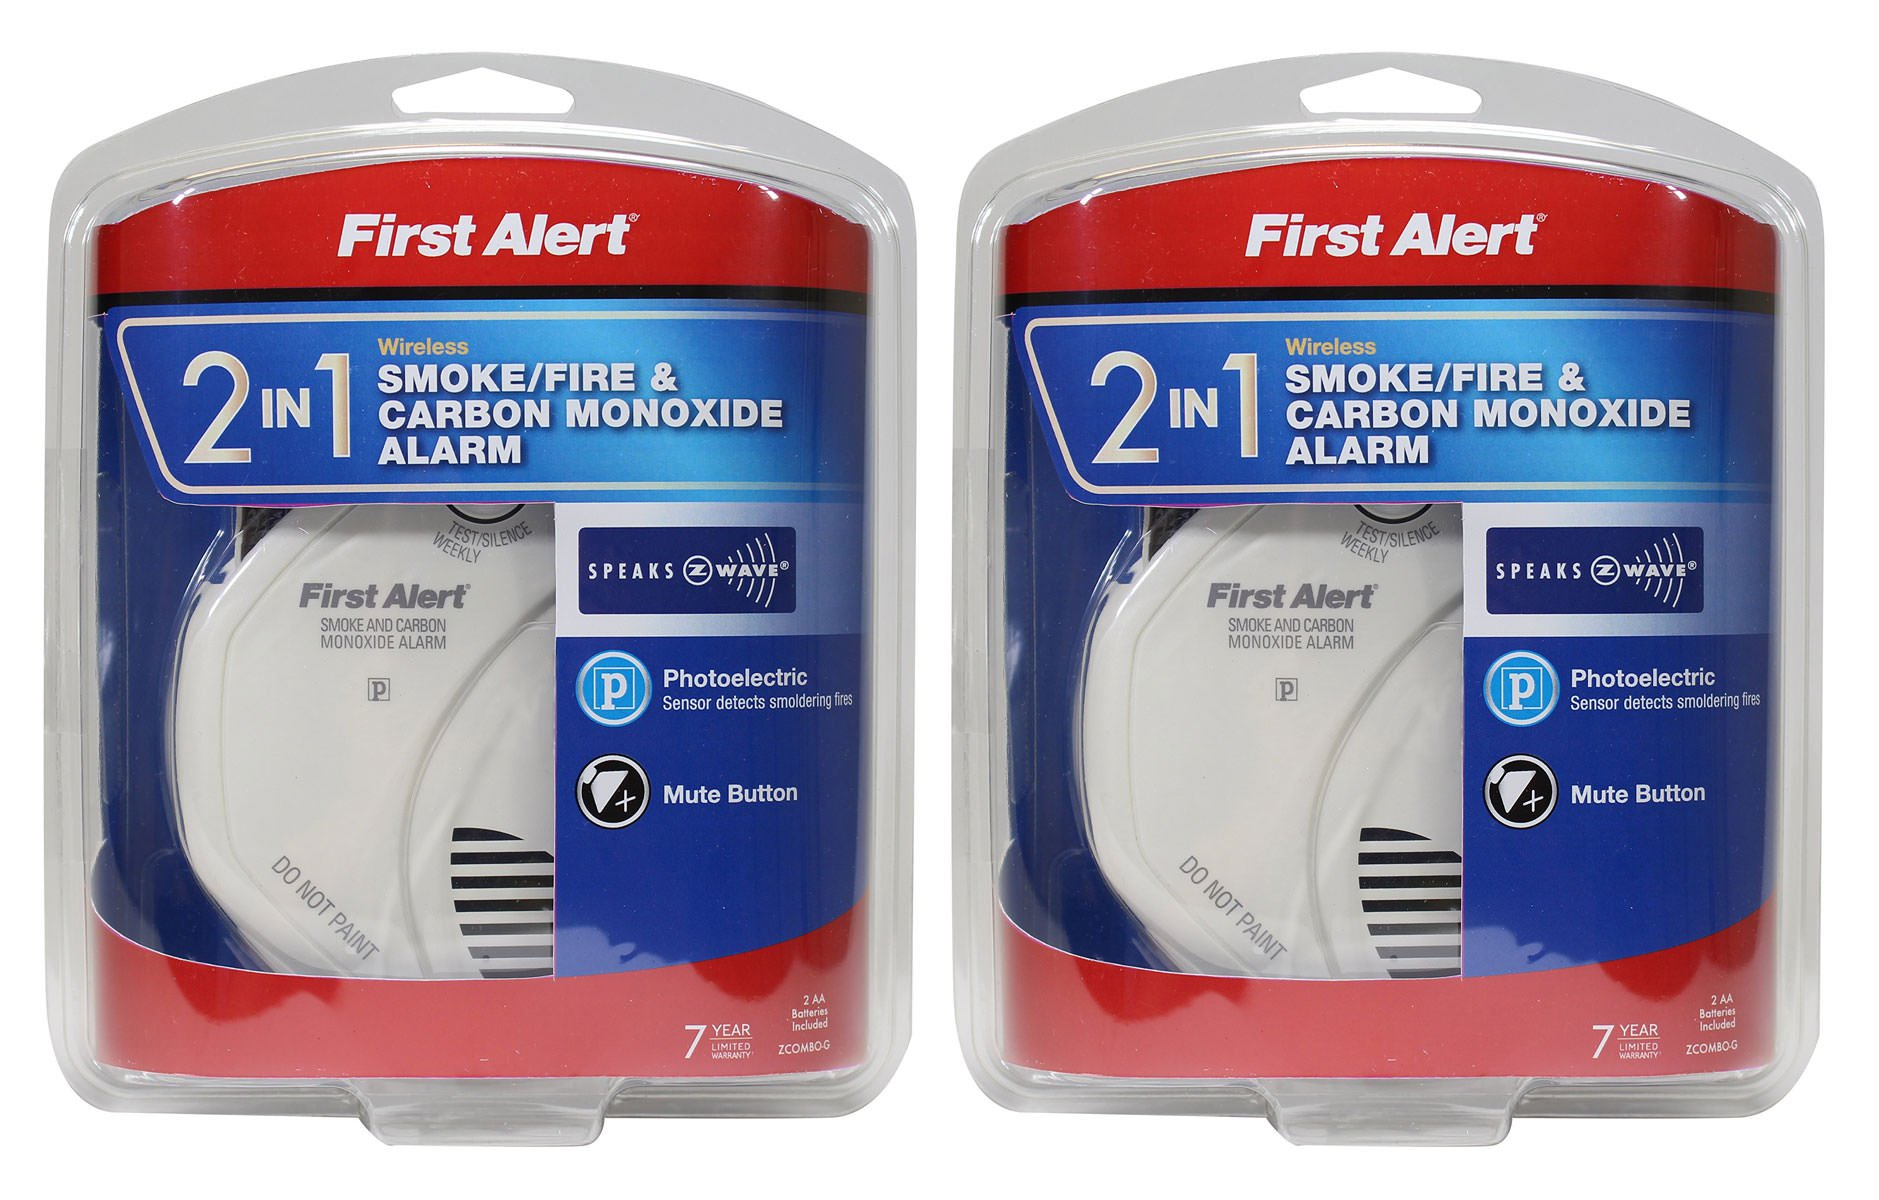 First Alert NBsDH 2-in-1 Z-Wave Smoke Detector & Carbon Monoxide Alarm 2 Pack